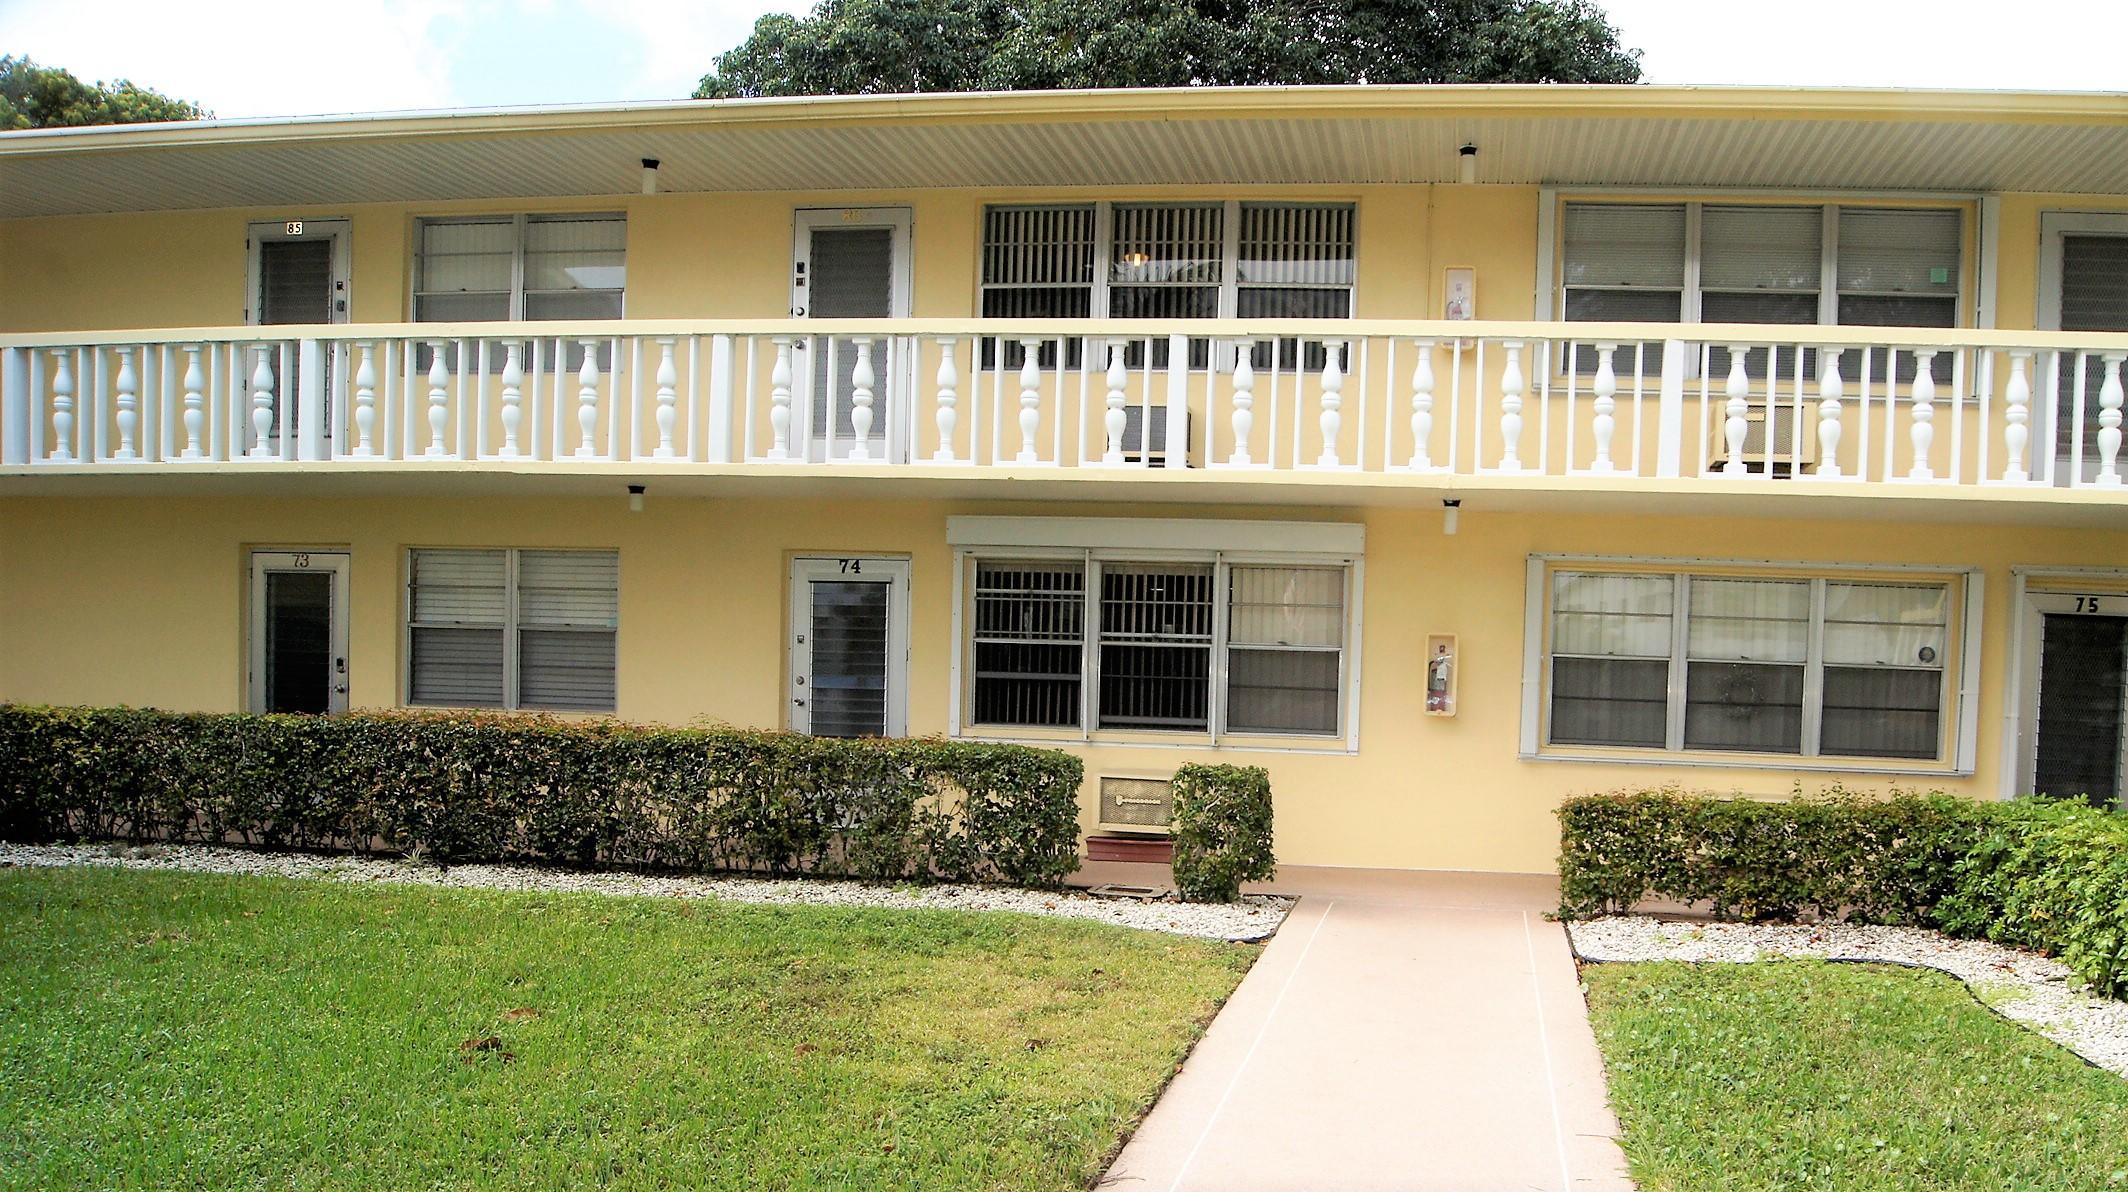 Photo of 86 Windsor D, West Palm Beach, FL 33417